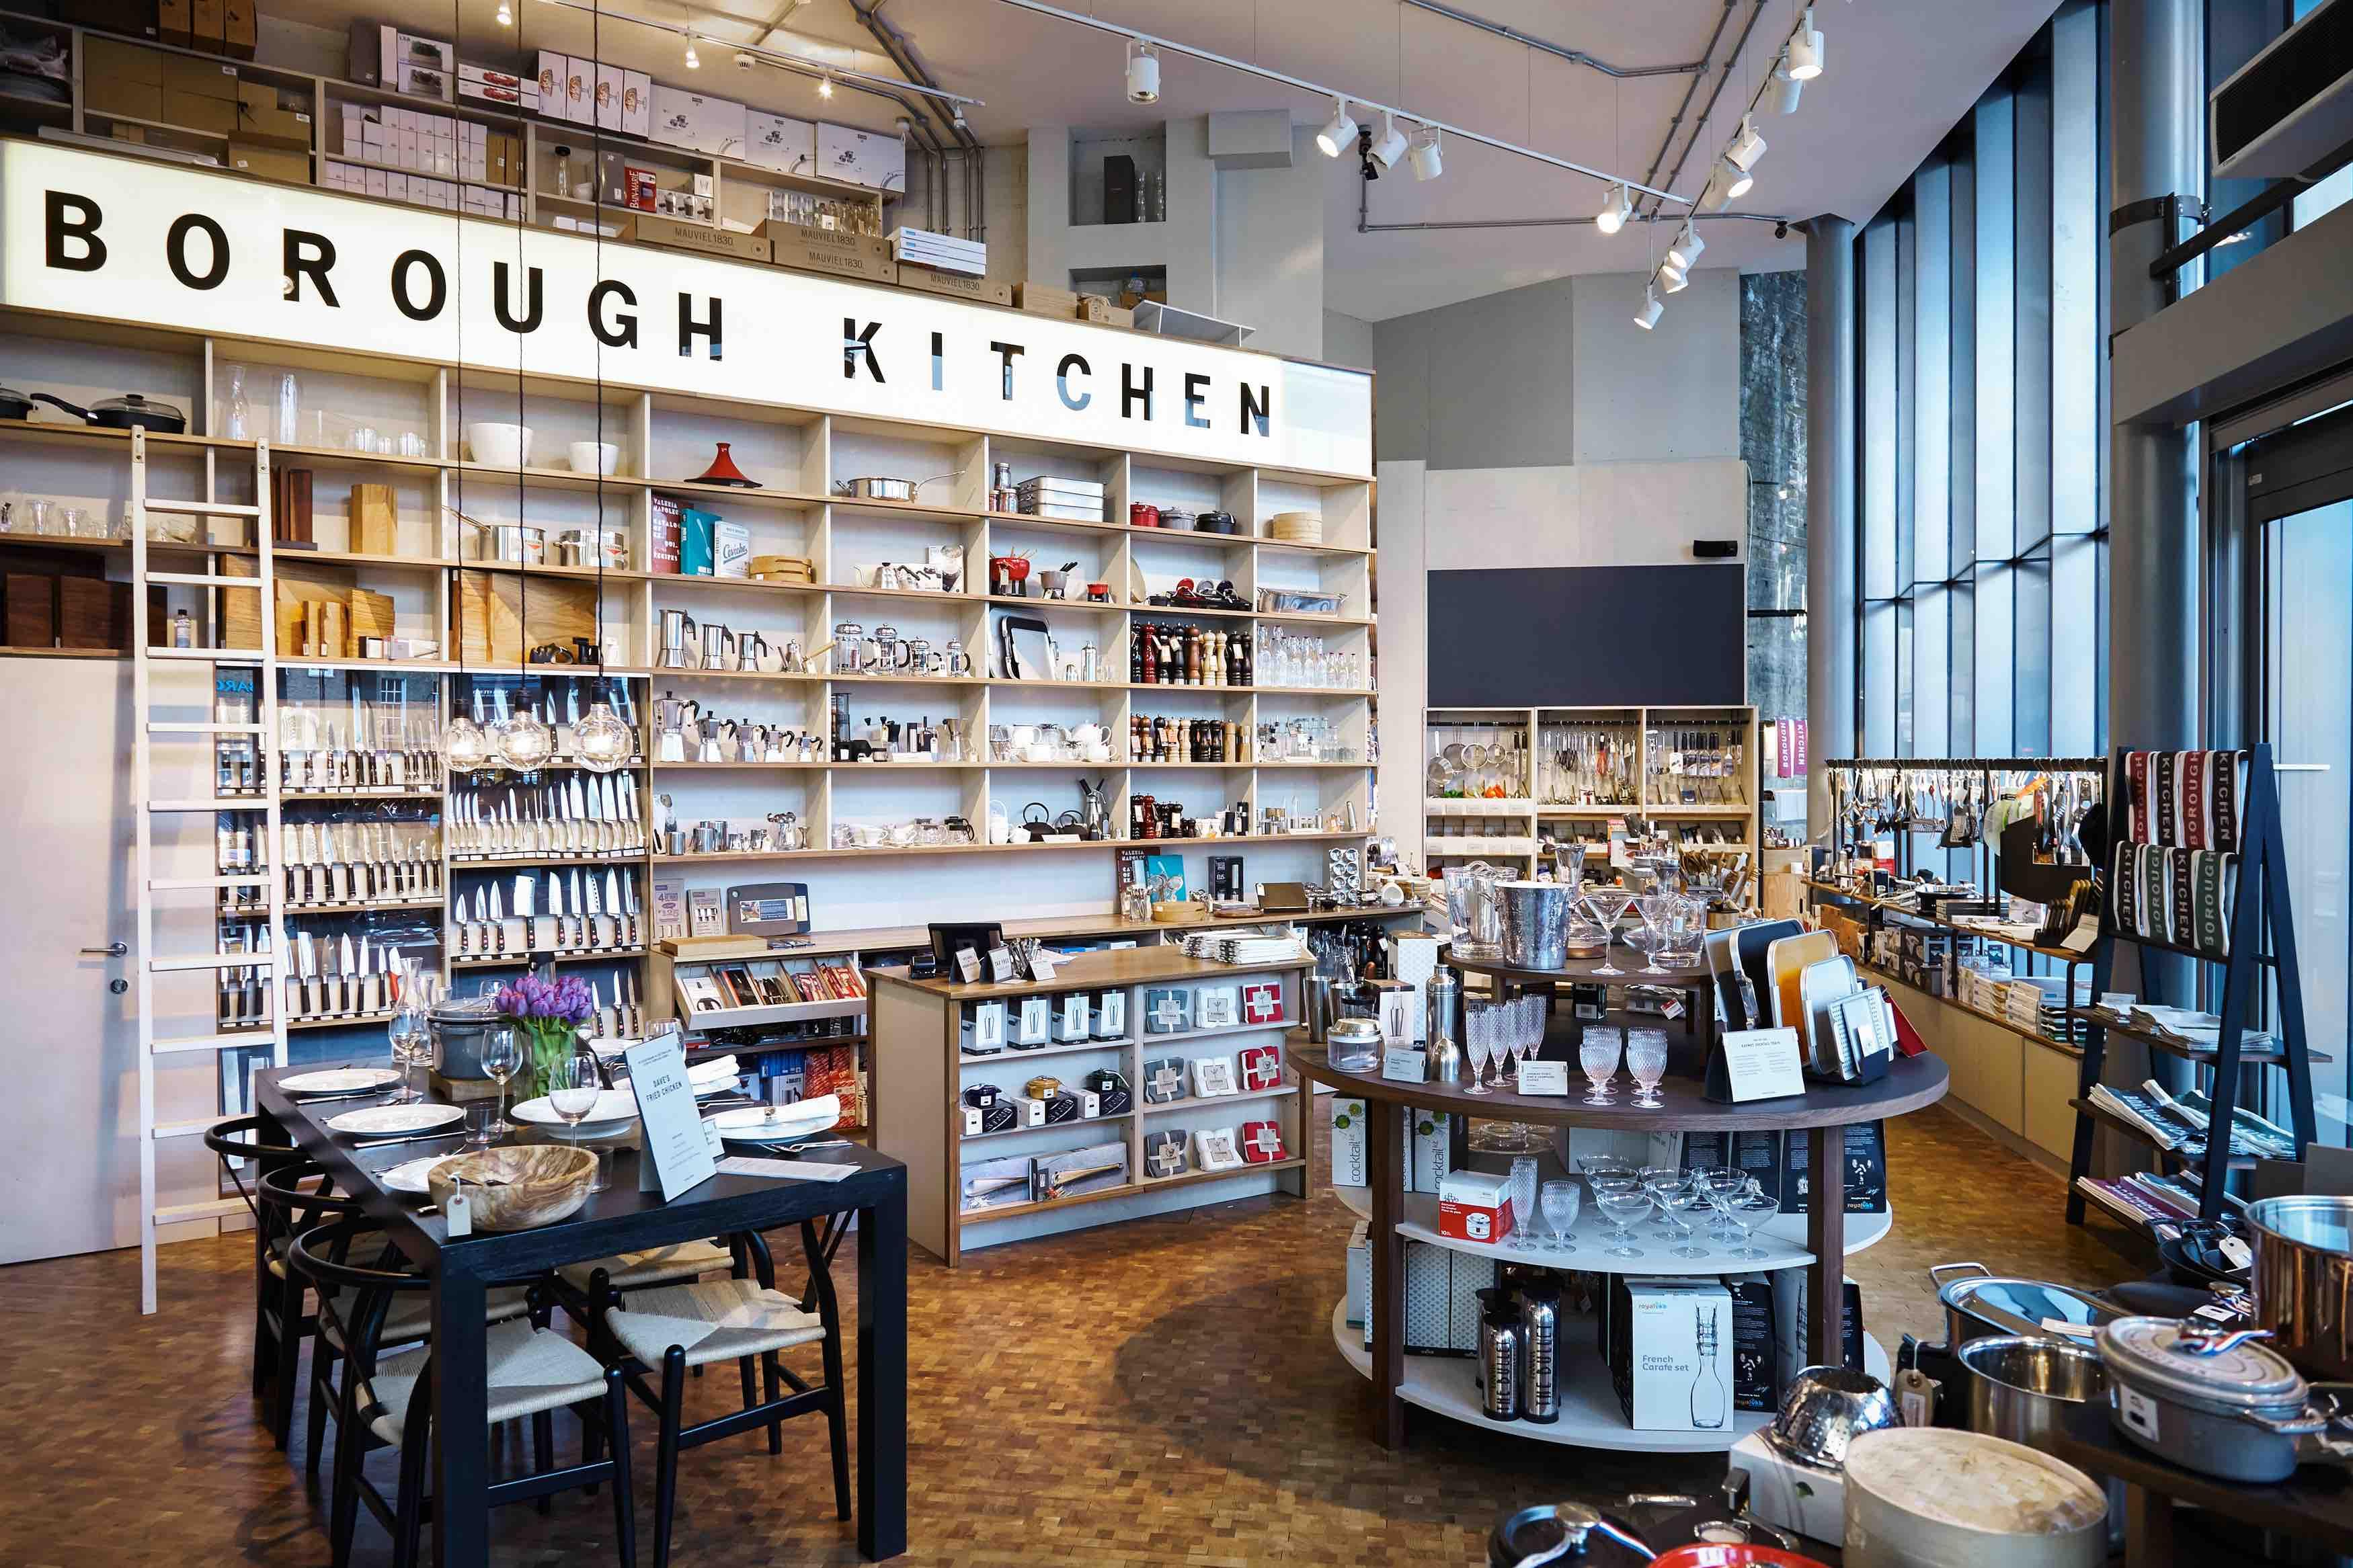 kitchen utensils store barn house 2017 gia global honoree borough international